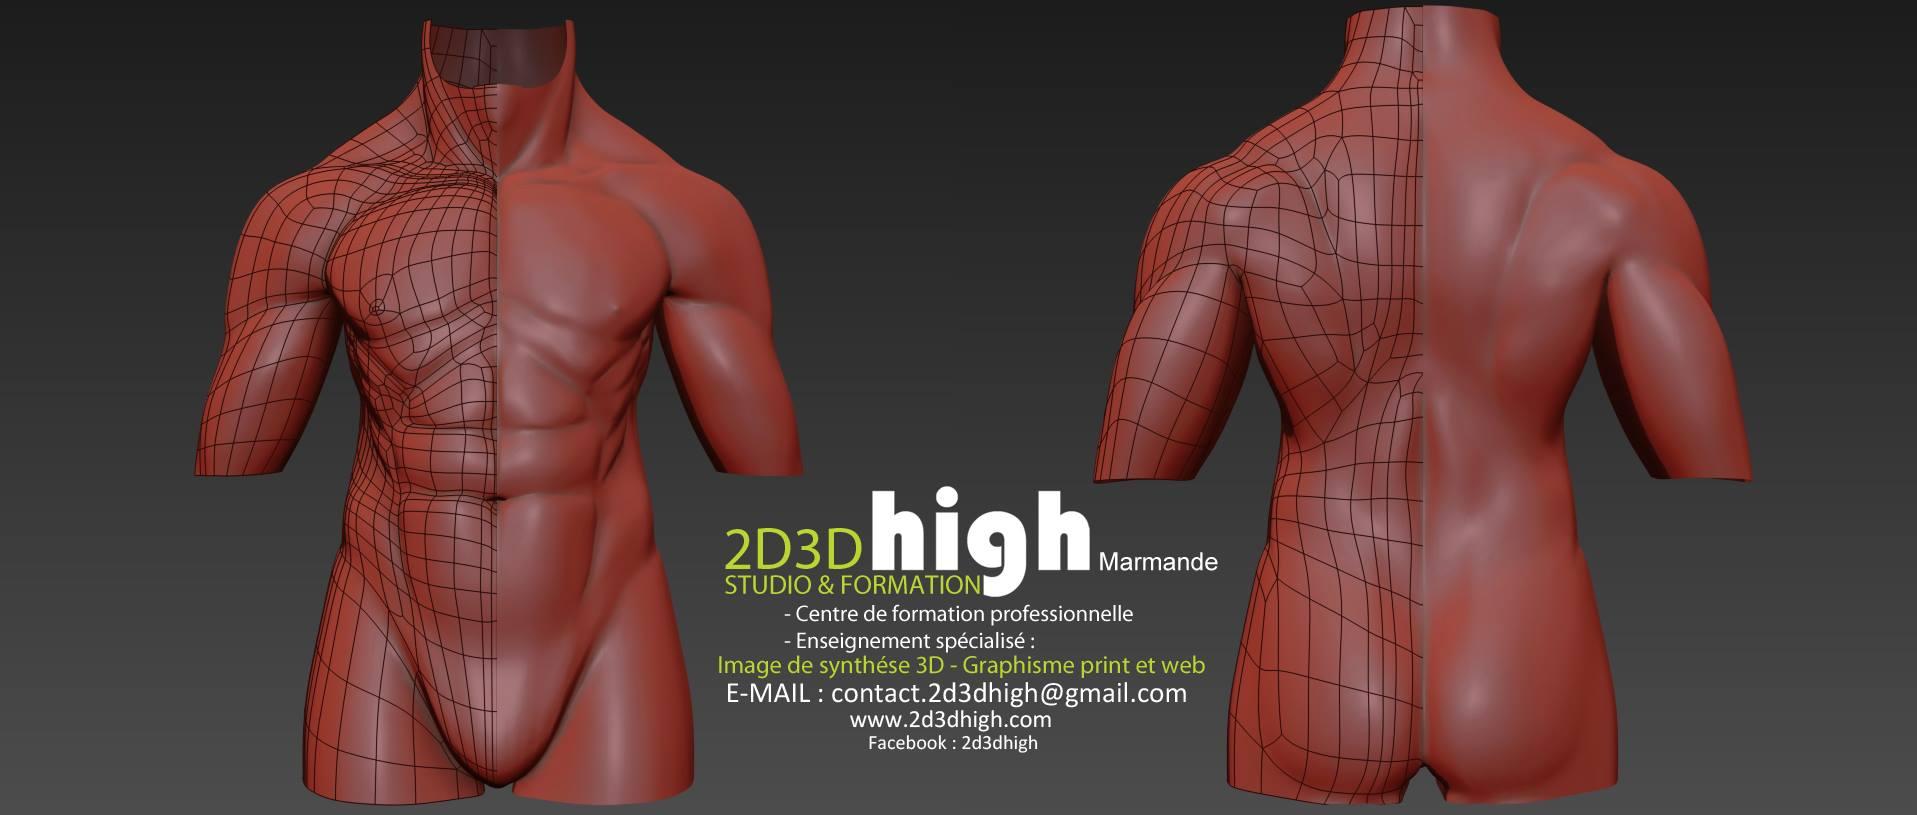 Travail d'anatomie - wireframe